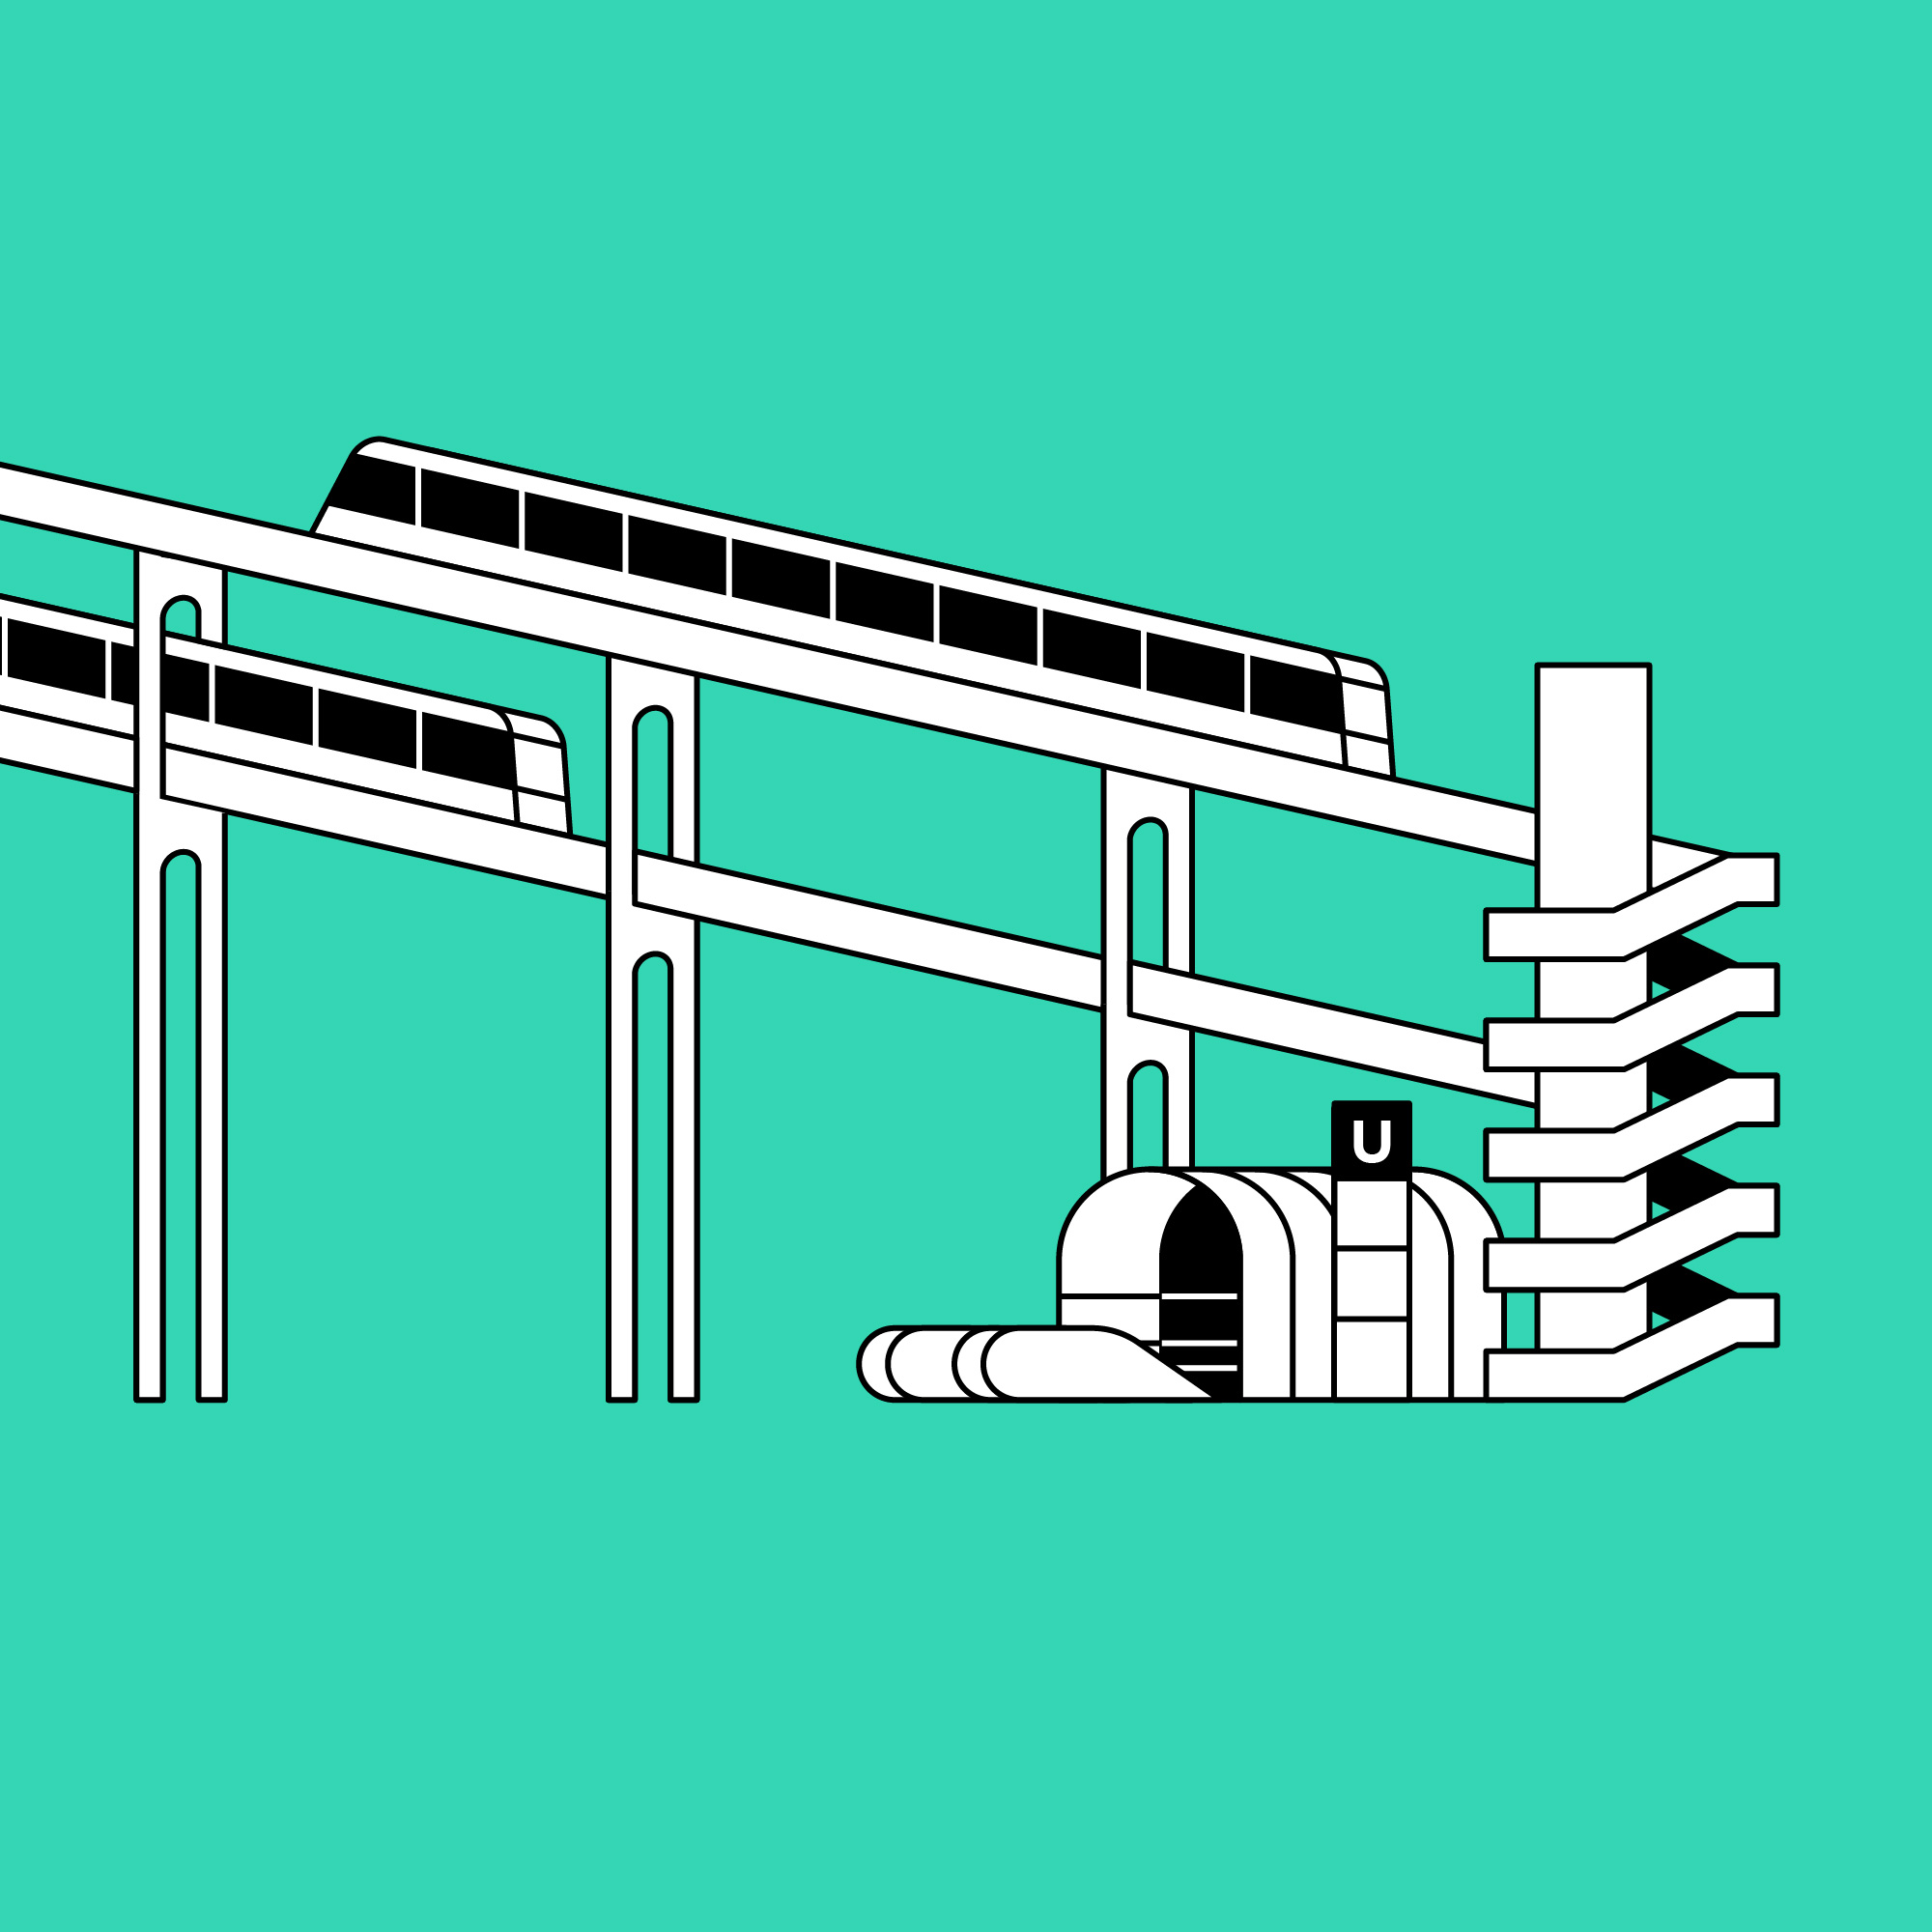 Titel: Urban structures: Transportation. Utopian two-storey furnicolare/cog railway